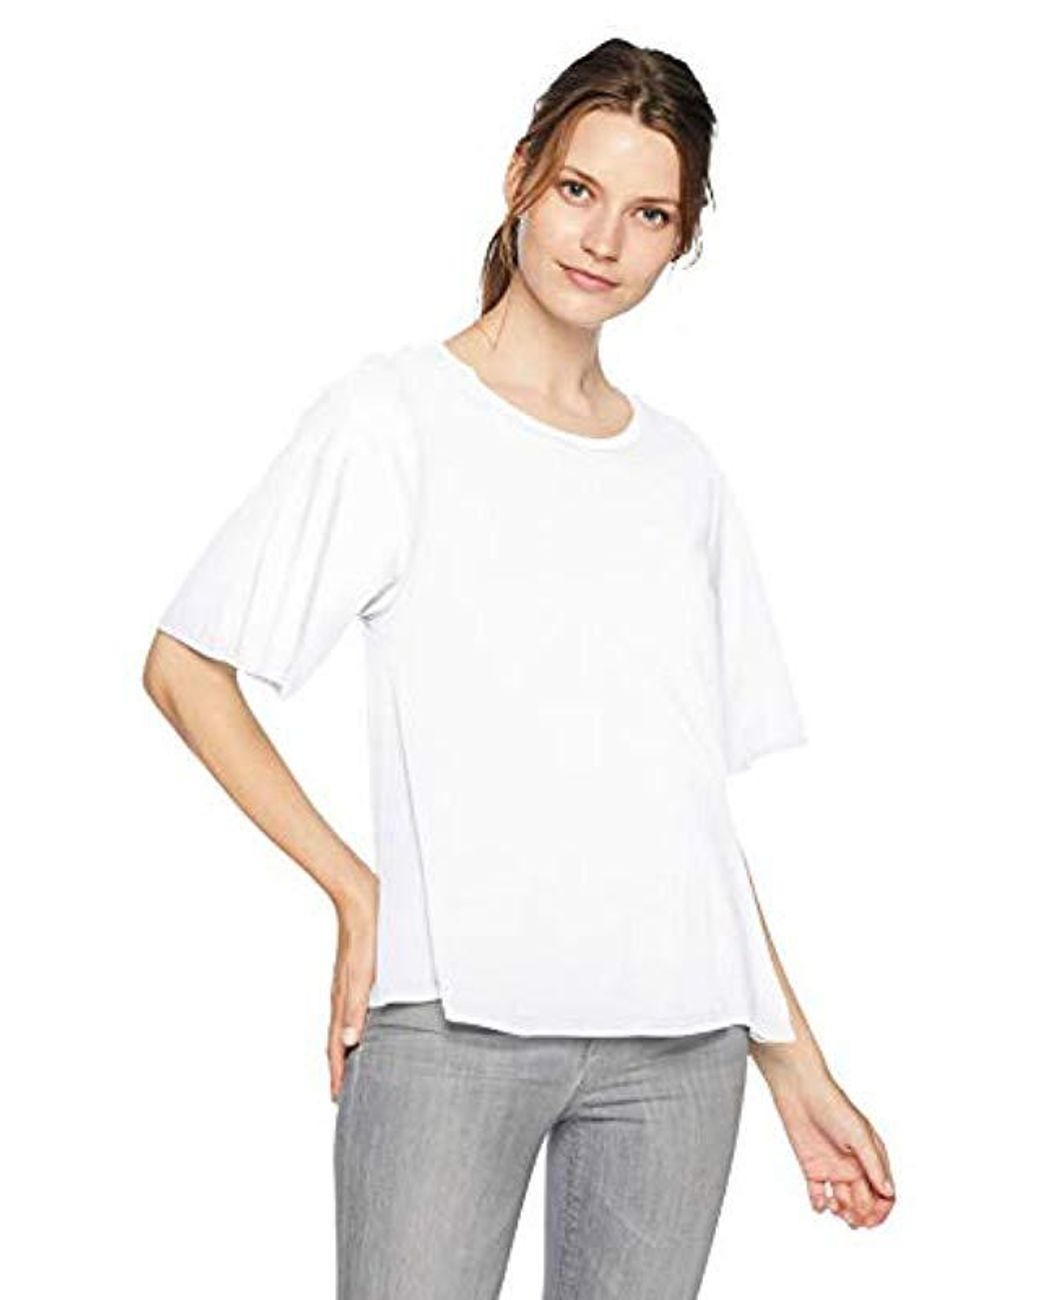 VELVET by GRAHAM /& SPENCER Ursula Linen Knit Tee Top Shirt Ivory Size M $94.00